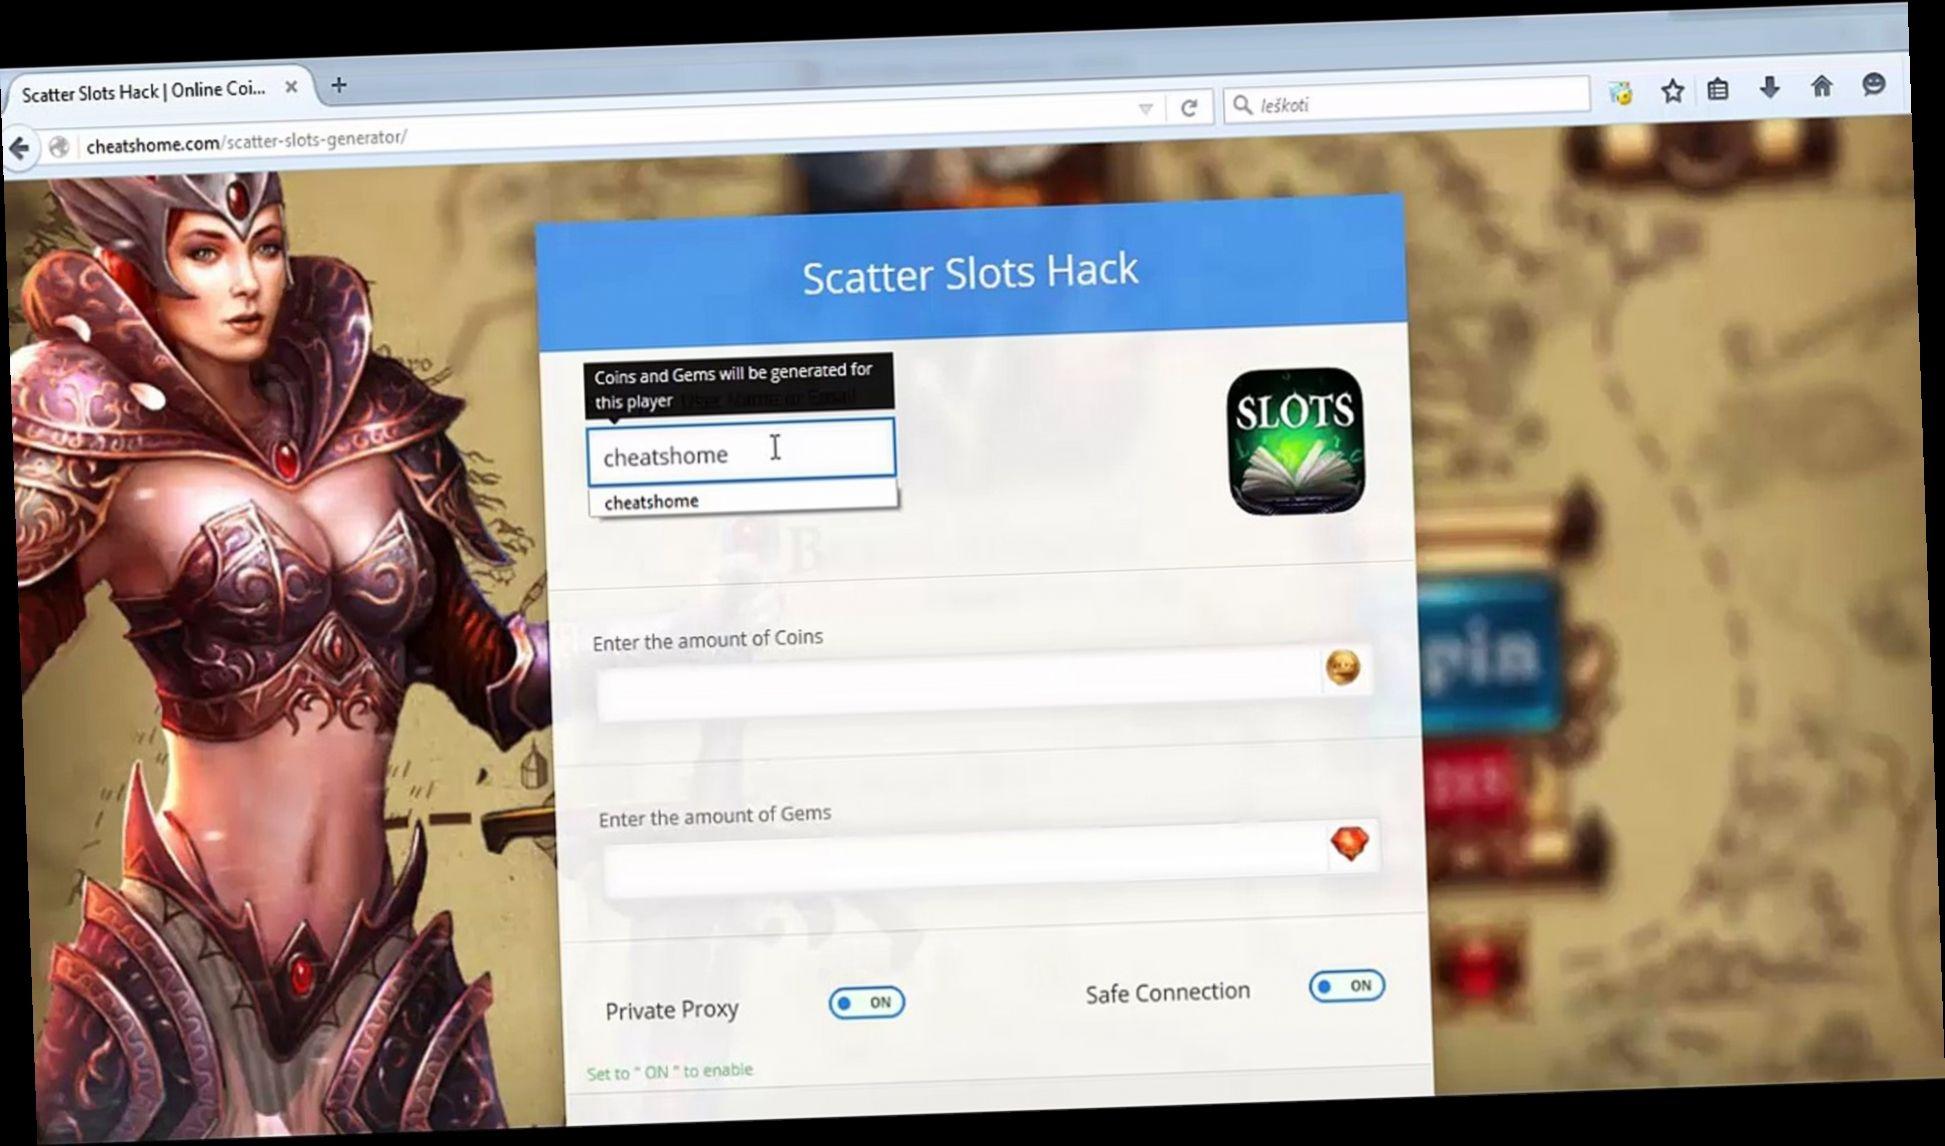 Scatter Slots Hack Tool